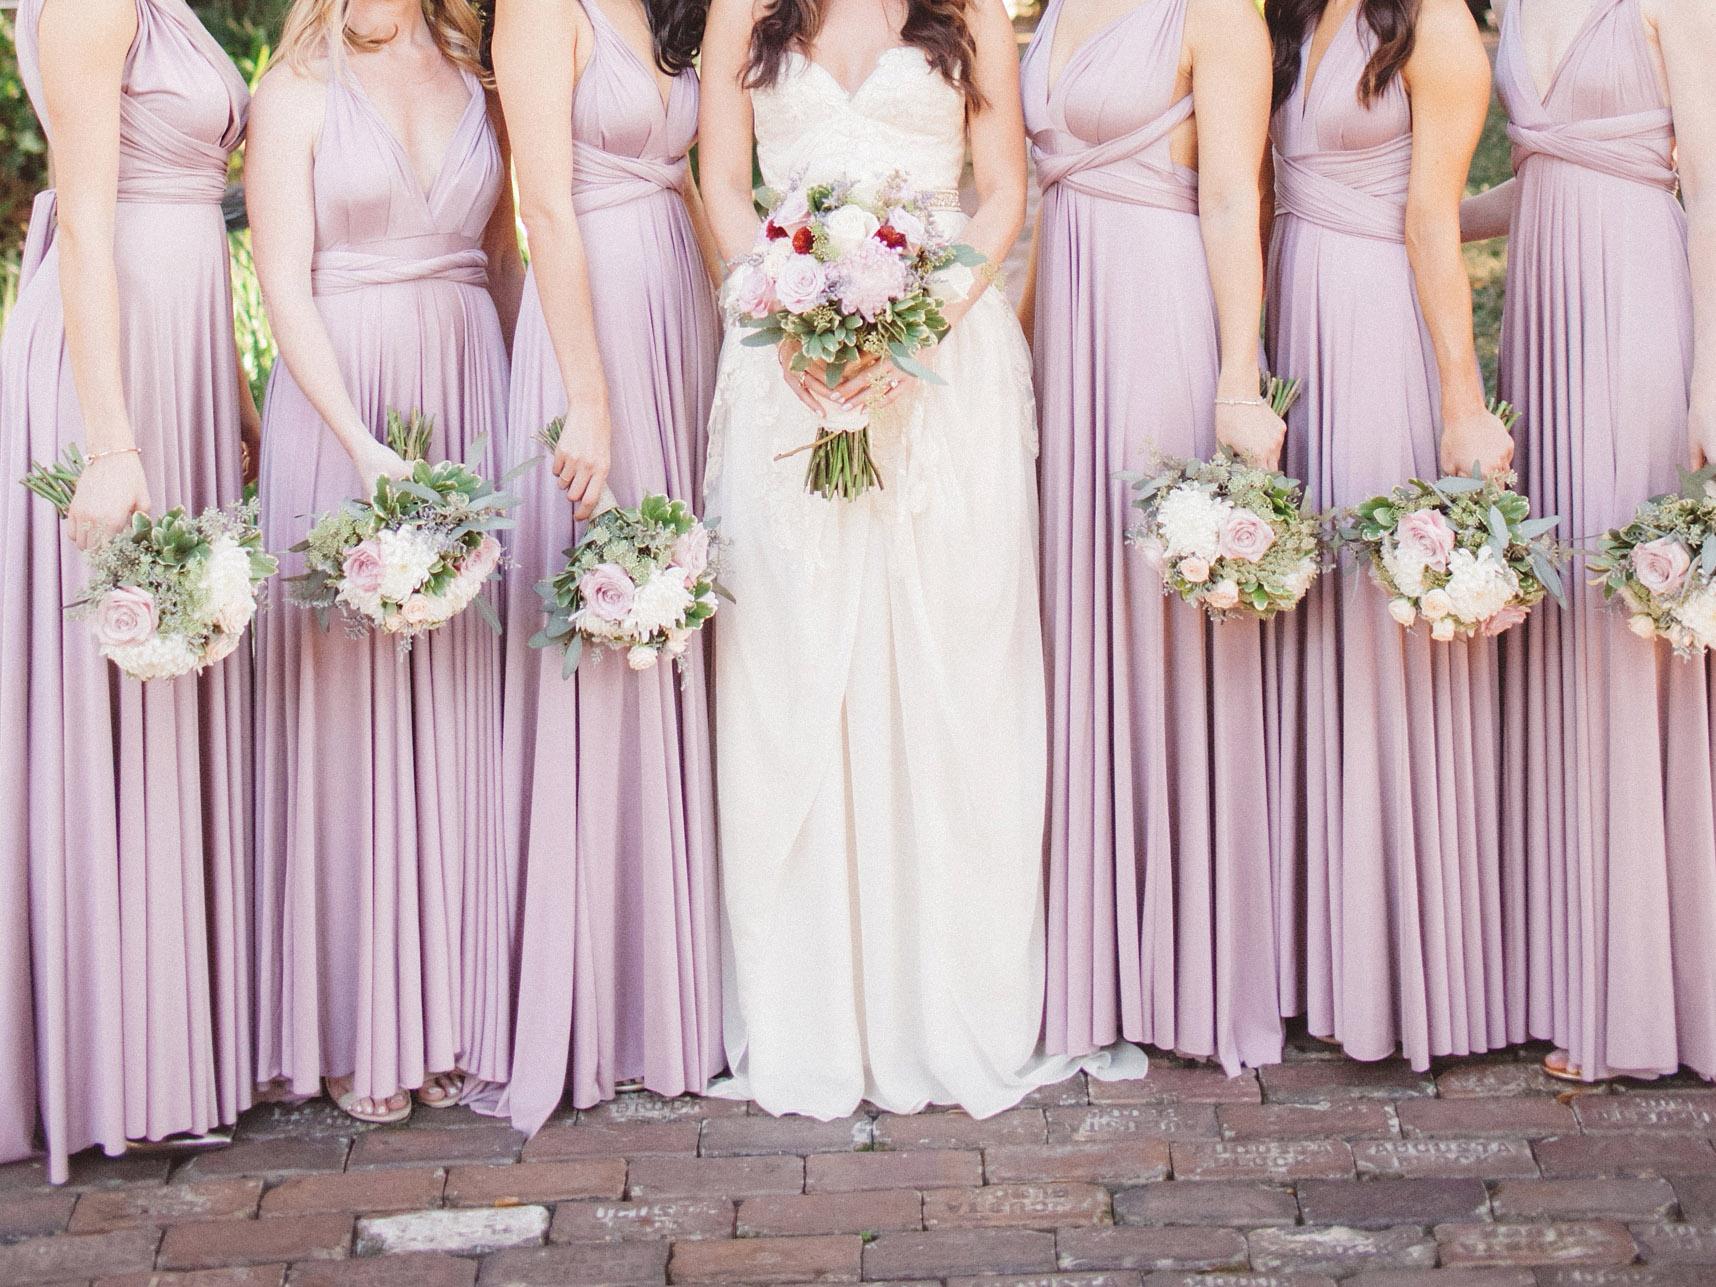 lilac bridesmaid and groom - HD1716×1287